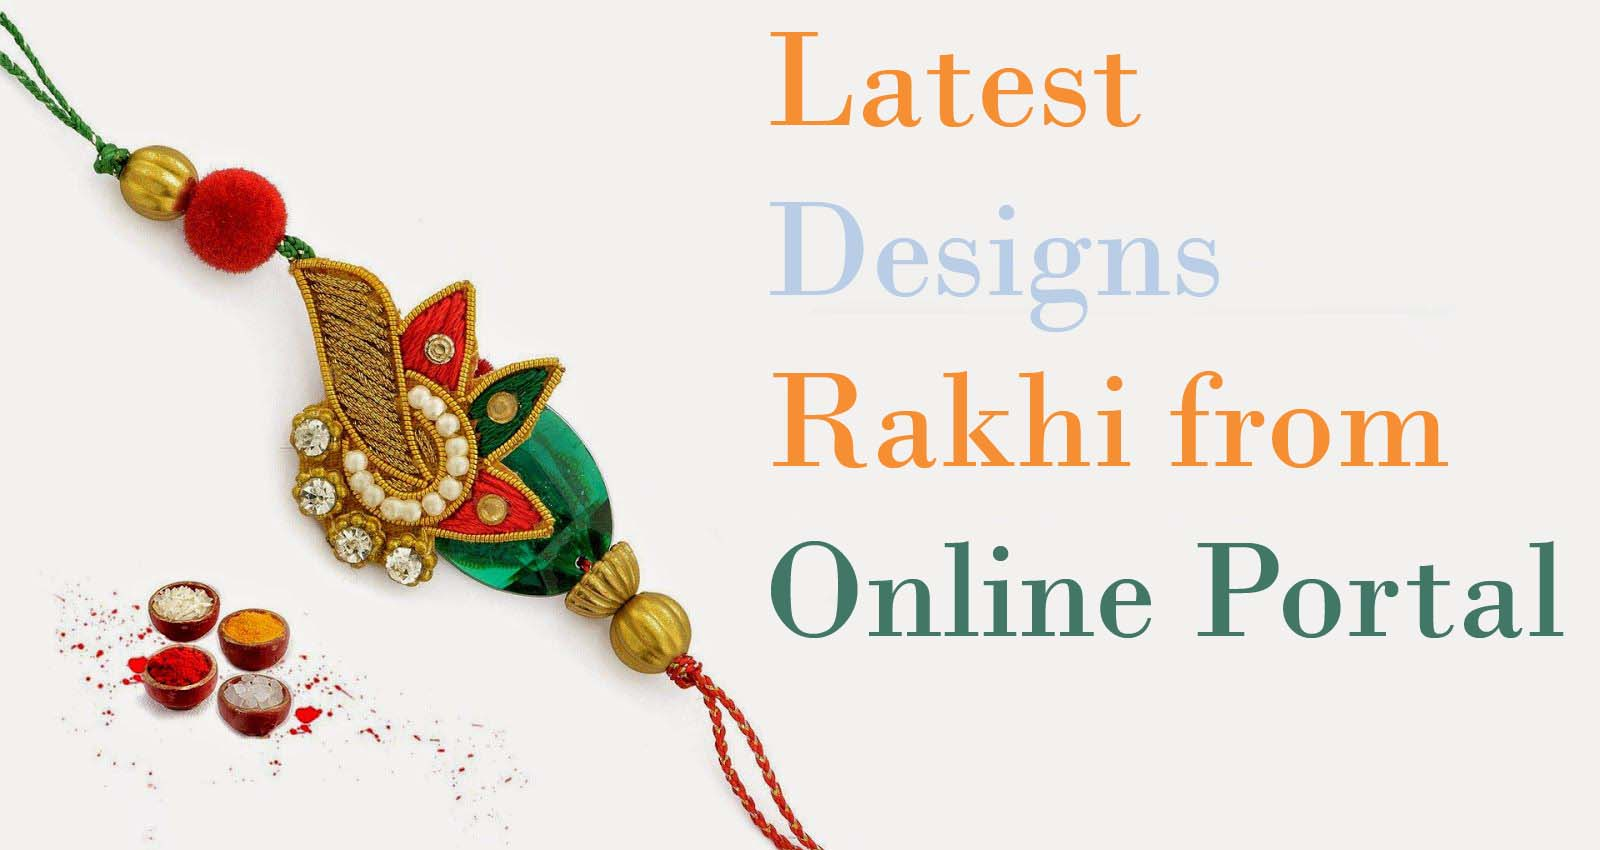 Latest designs Rakhi from online portal - latestworldtrends.com